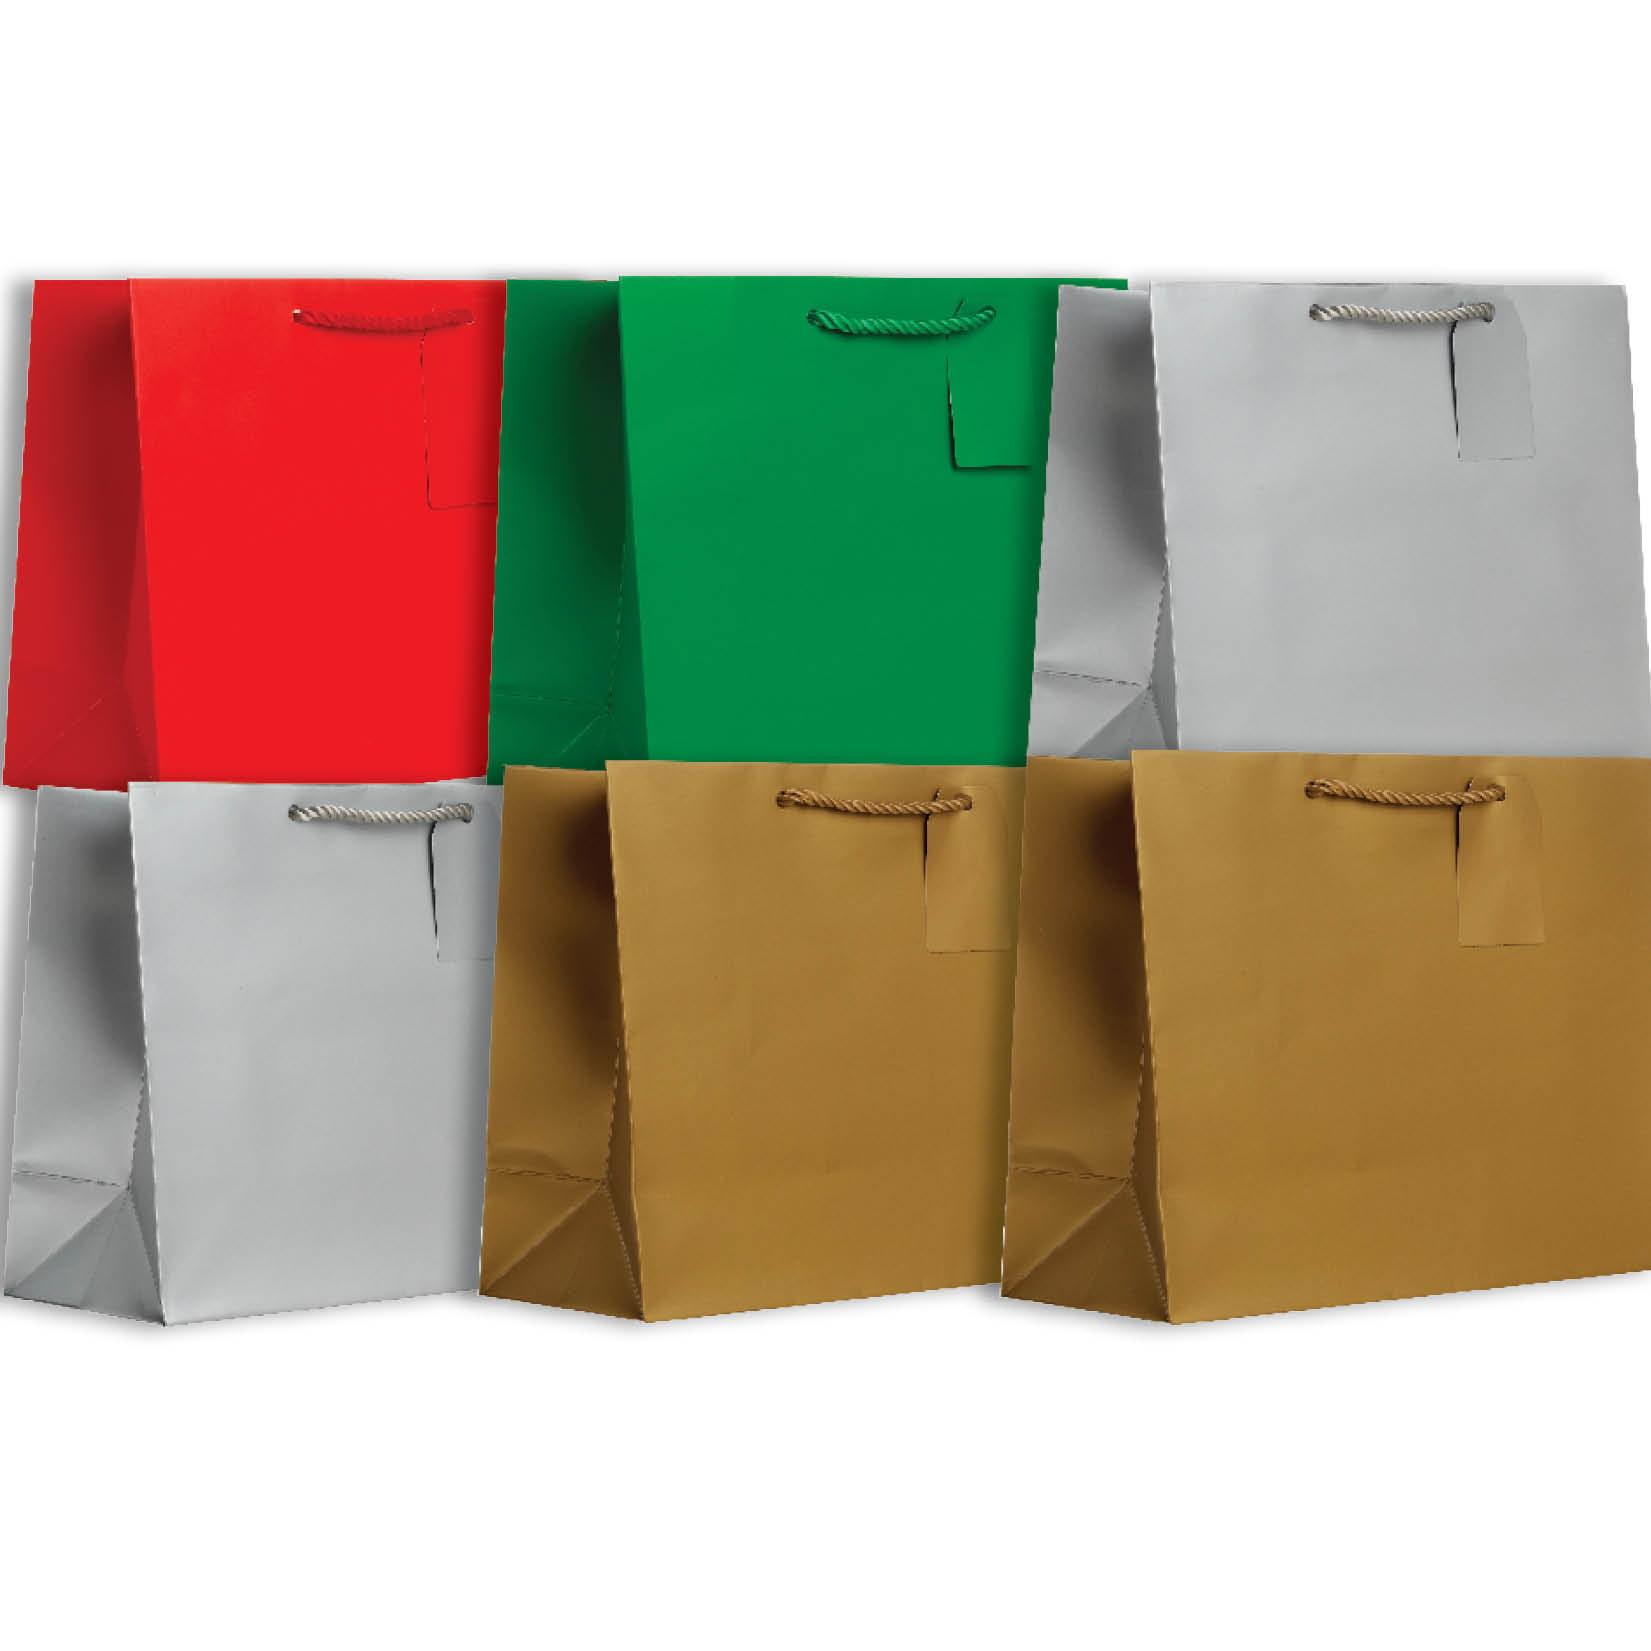 Jillson & Roberts Solid Color Matte Large Gift Bag Assortment, Christmas (6 Bags)